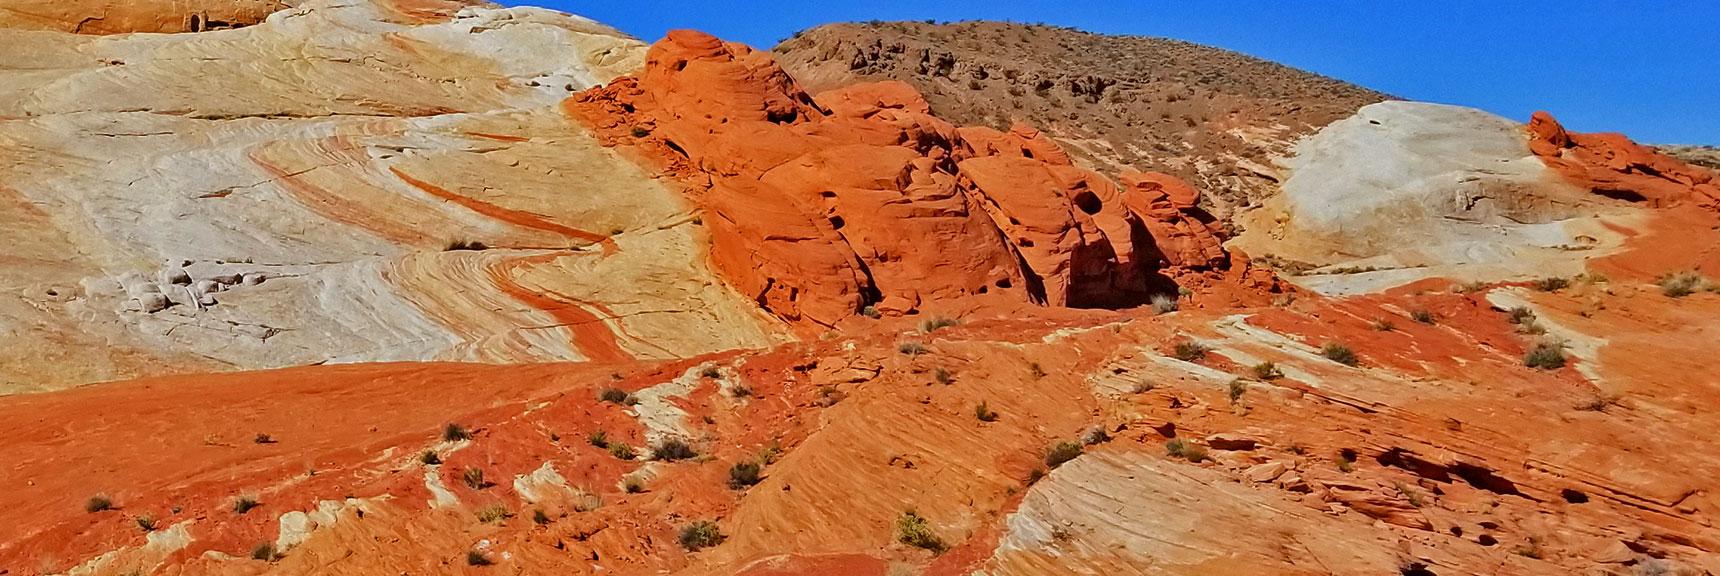 Firewave in Valley of Fire State Park, Nevada, Slide 014